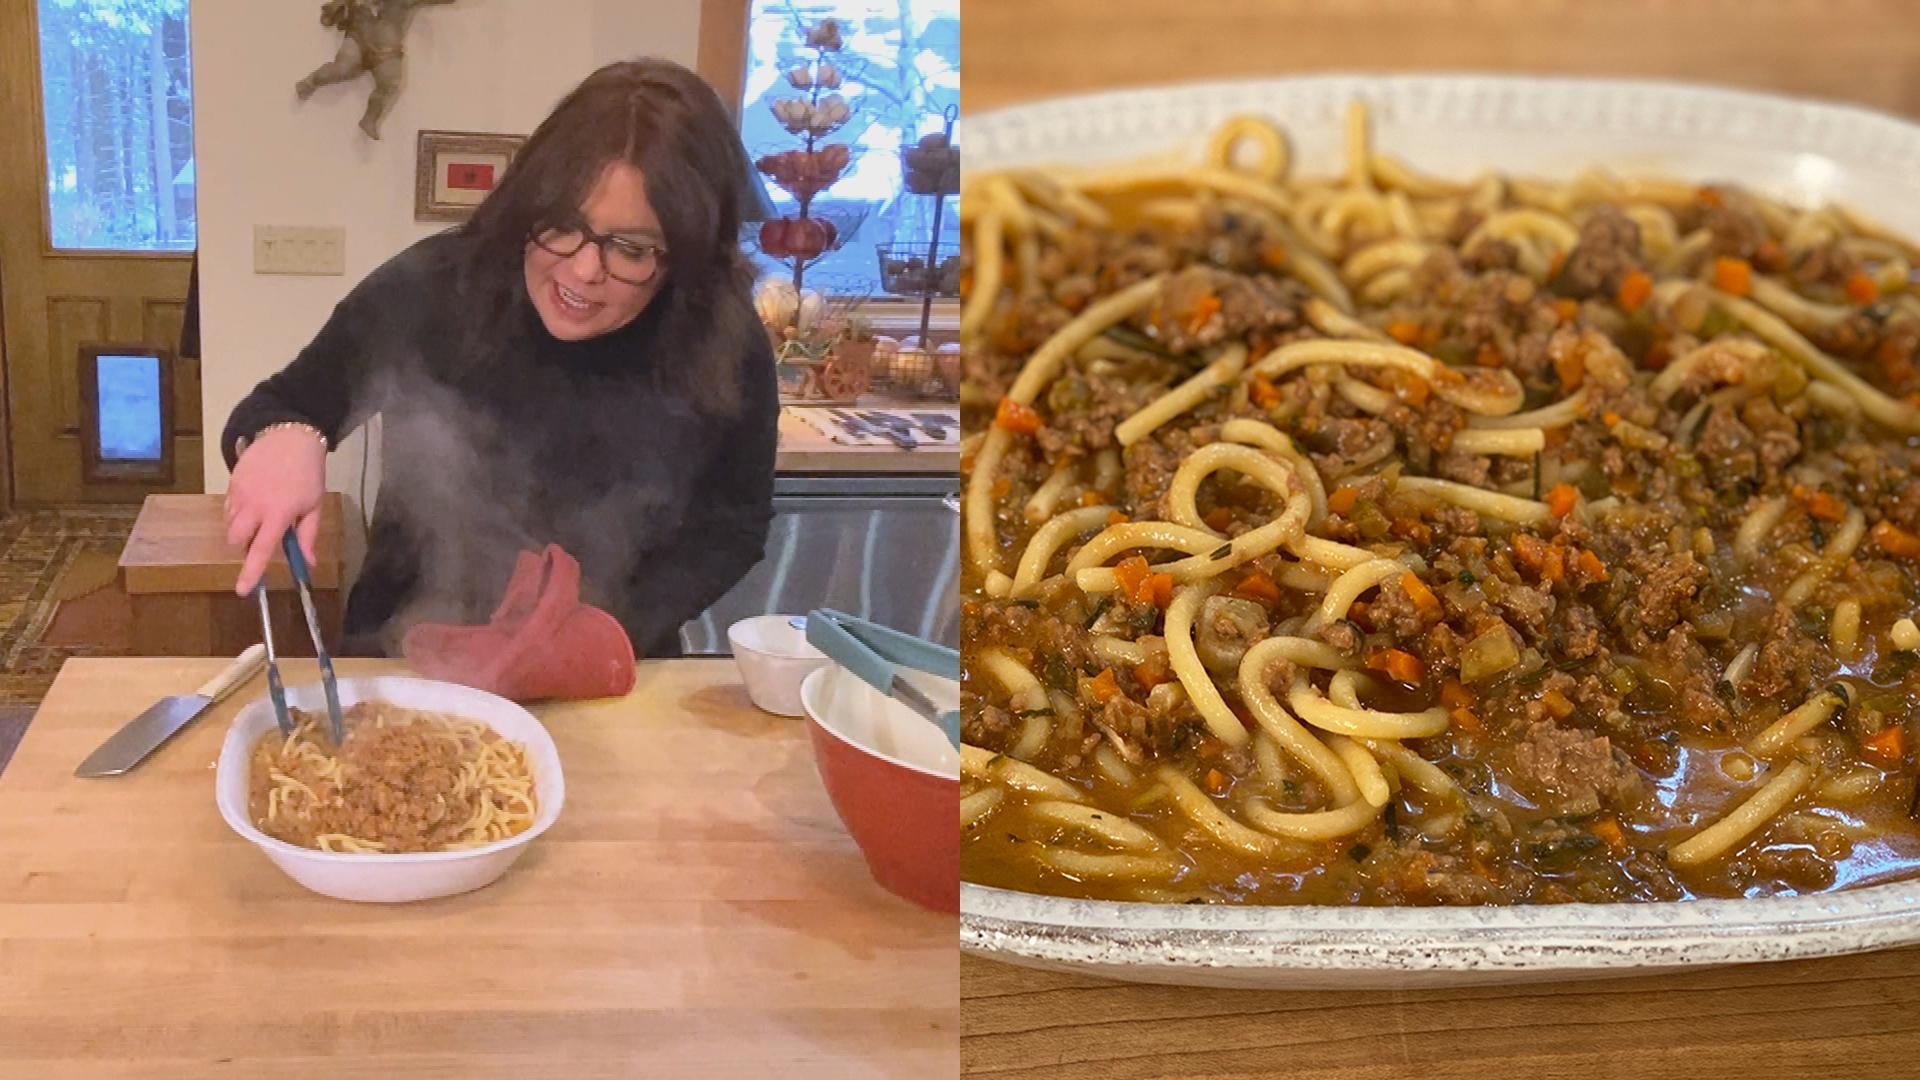 Tuscan Ragu with Pici | Meatless Ragu Recipe With Pasta (Vegetarian!)